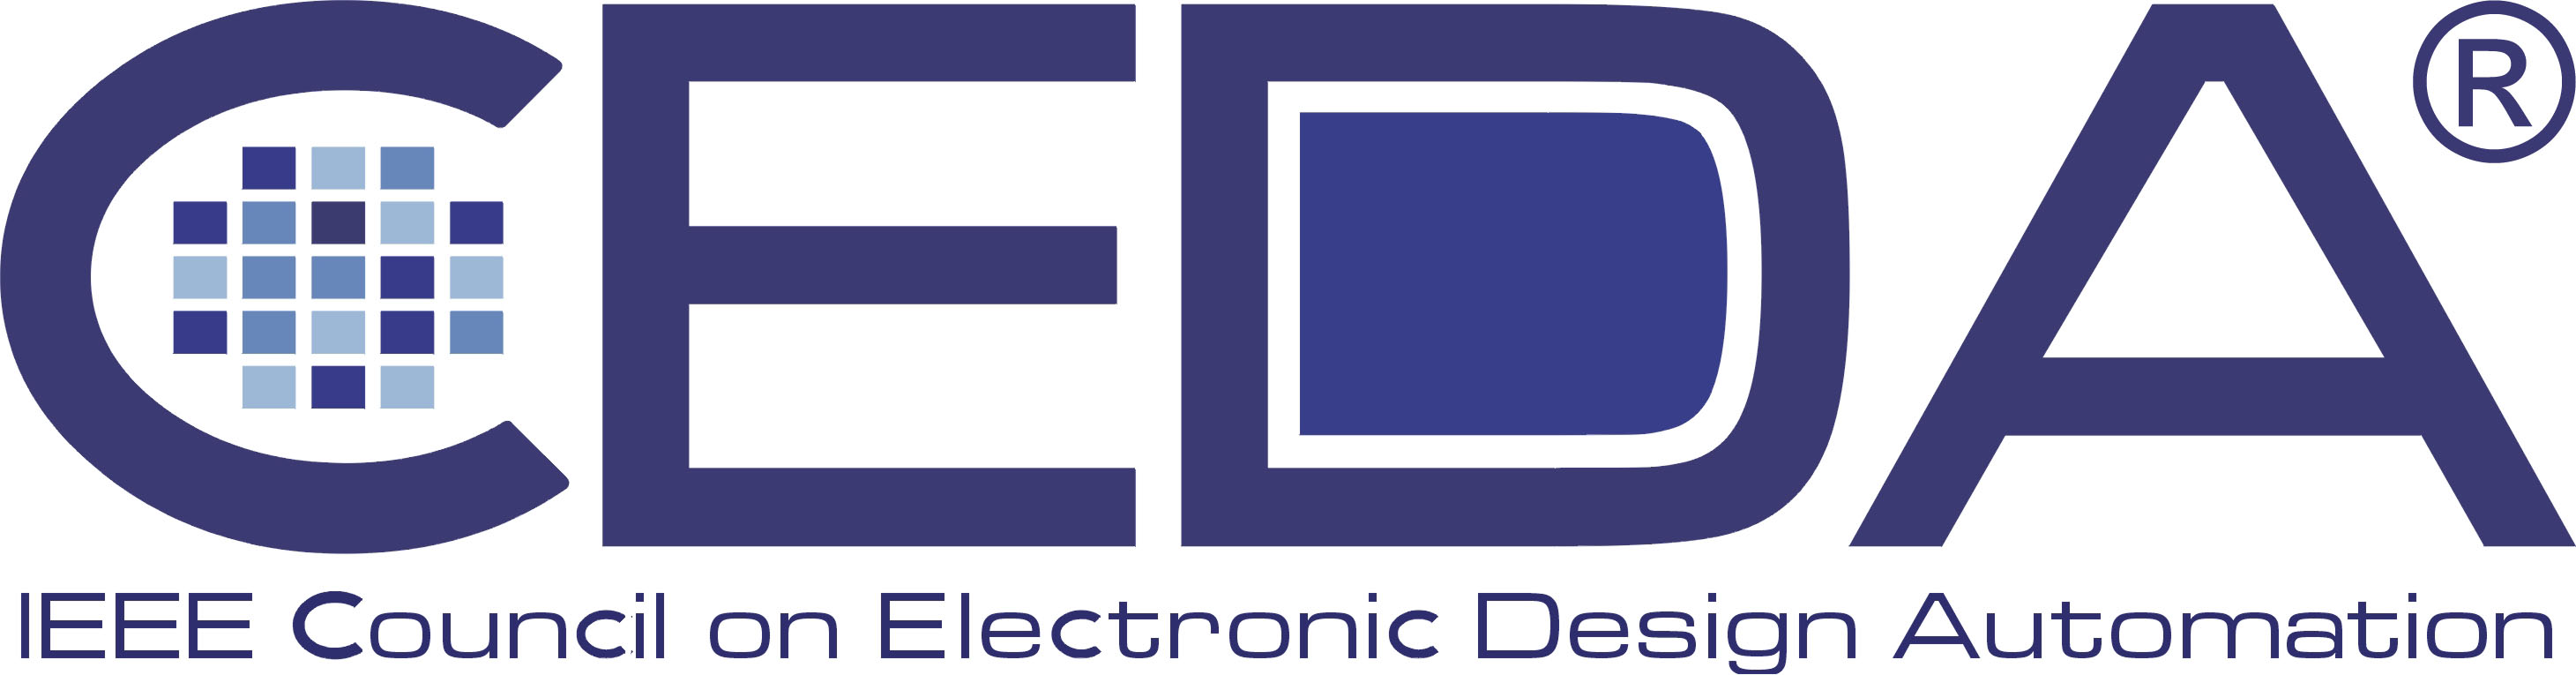 http://www.cse.cuhk.edu.hk/~byu/img/img-sigda/logo-ceda.jpg